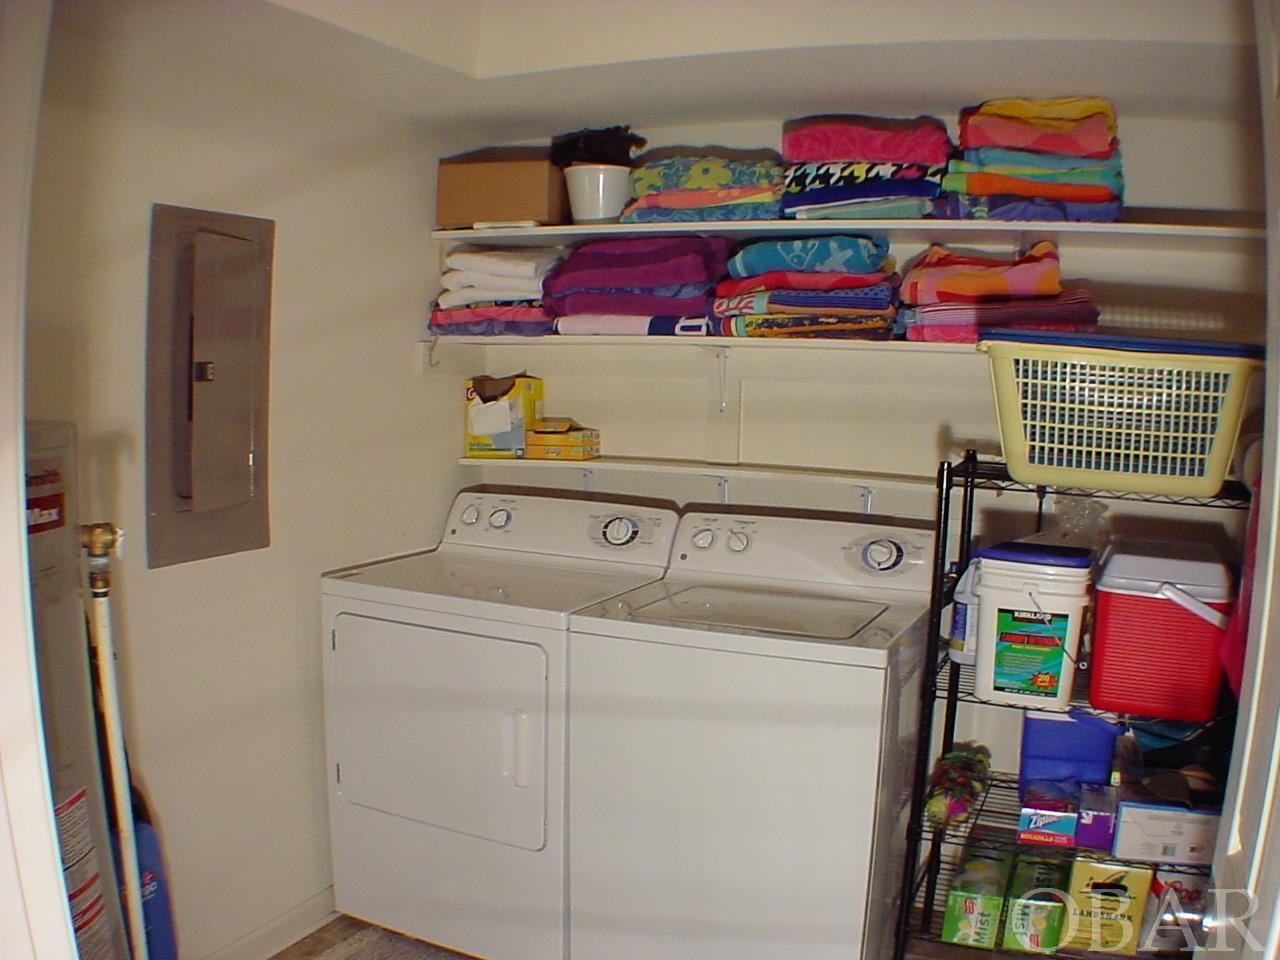 429 Ridgeview Way,Nags Head,NC 27959,4 Bedrooms Bedrooms,3 BathroomsBathrooms,Residential,Ridgeview Way,97311